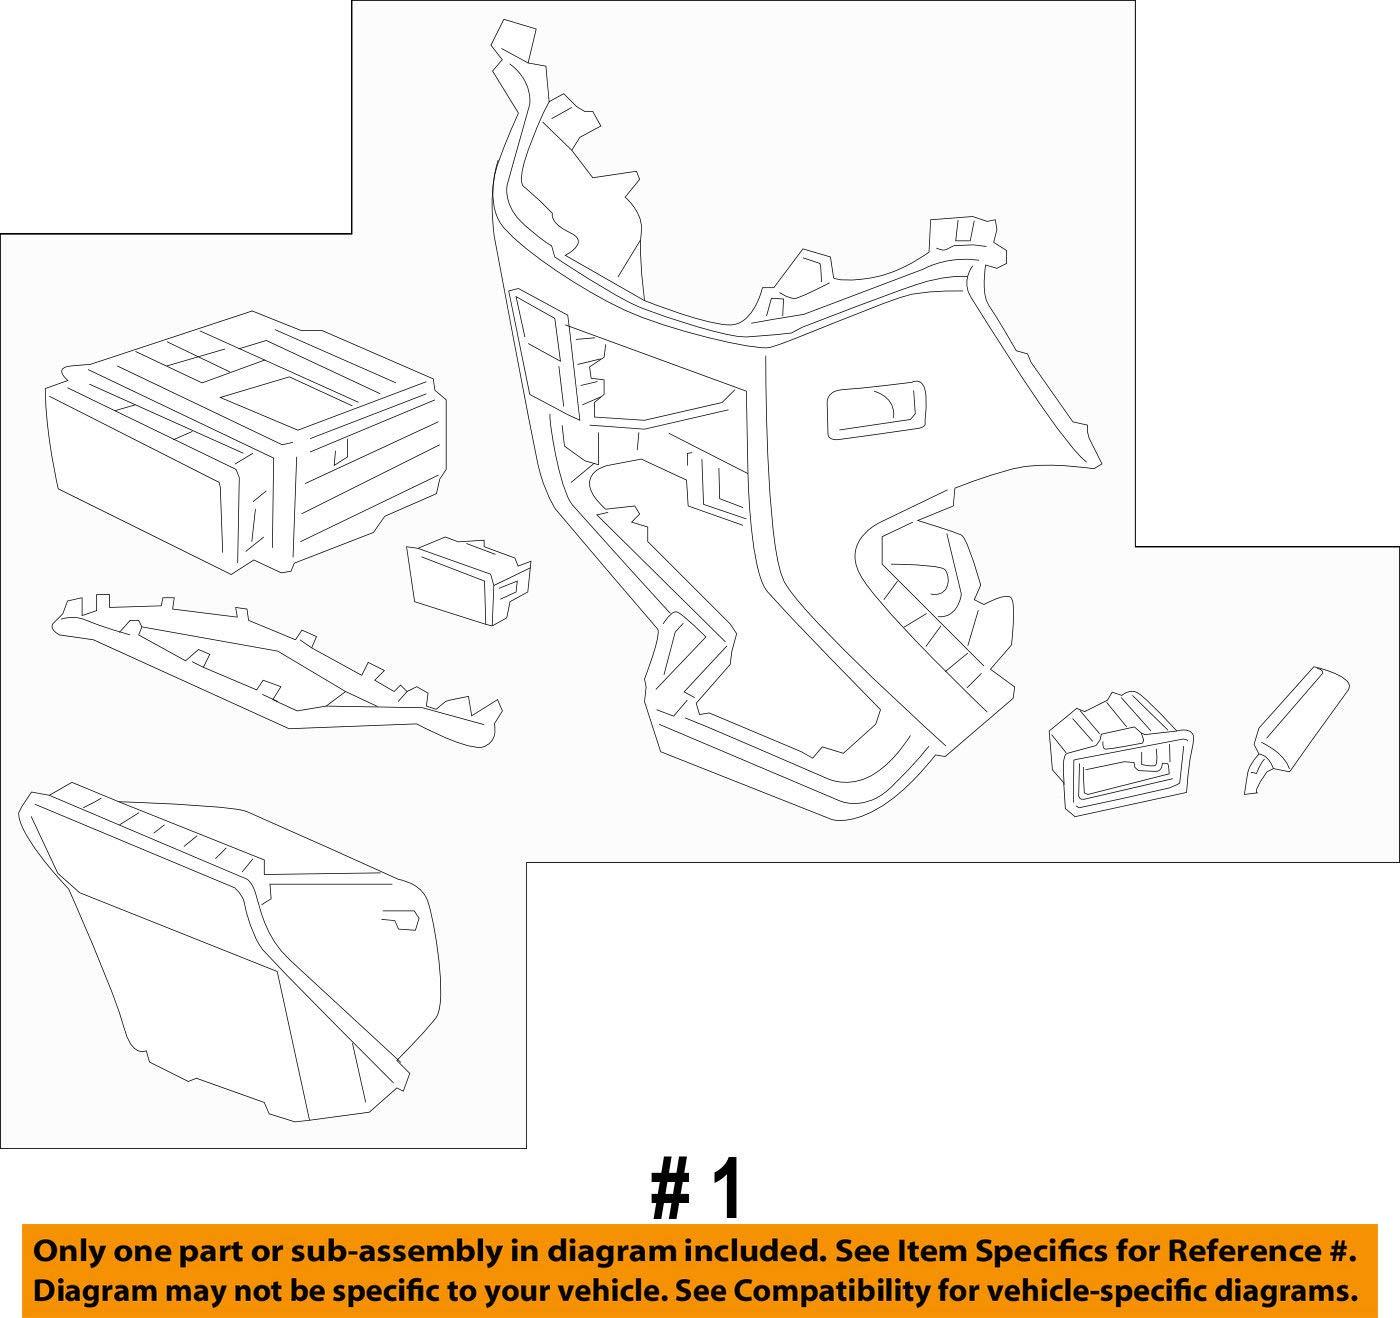 Honda Genuine 77299-TK8-A11ZB Center Console Assembly